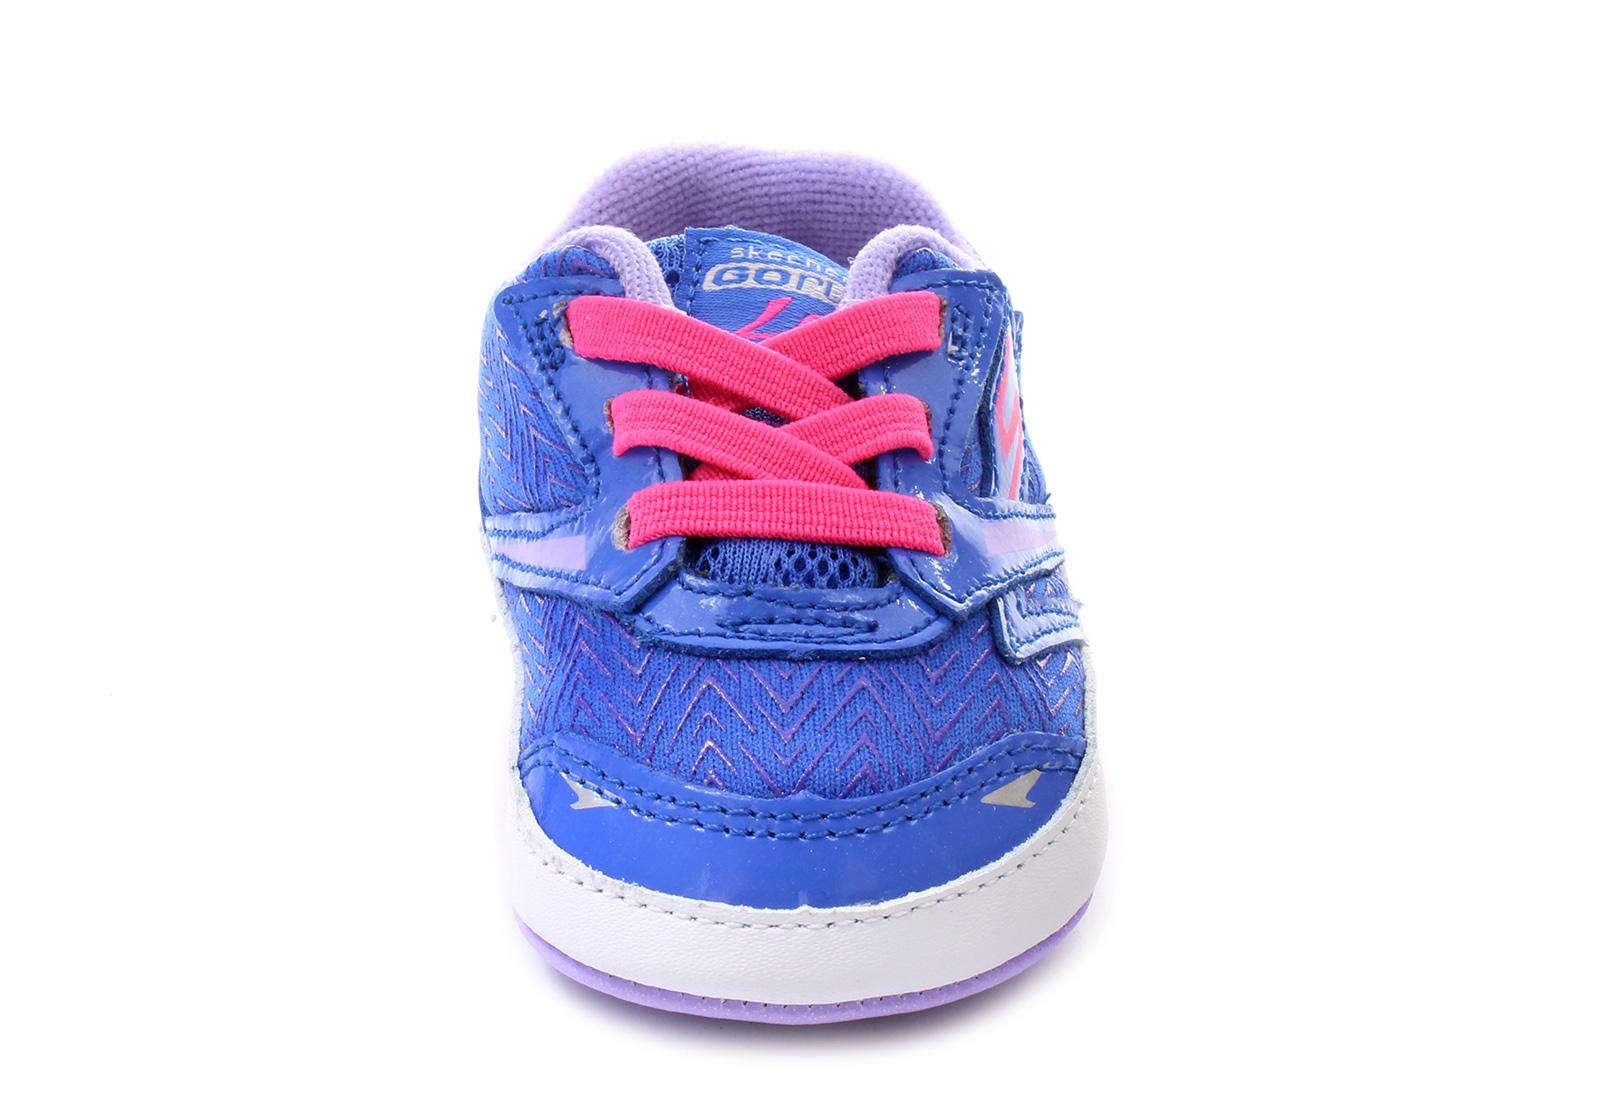 Skechers Shoes Baby Go Run 4 N BLPK line shop